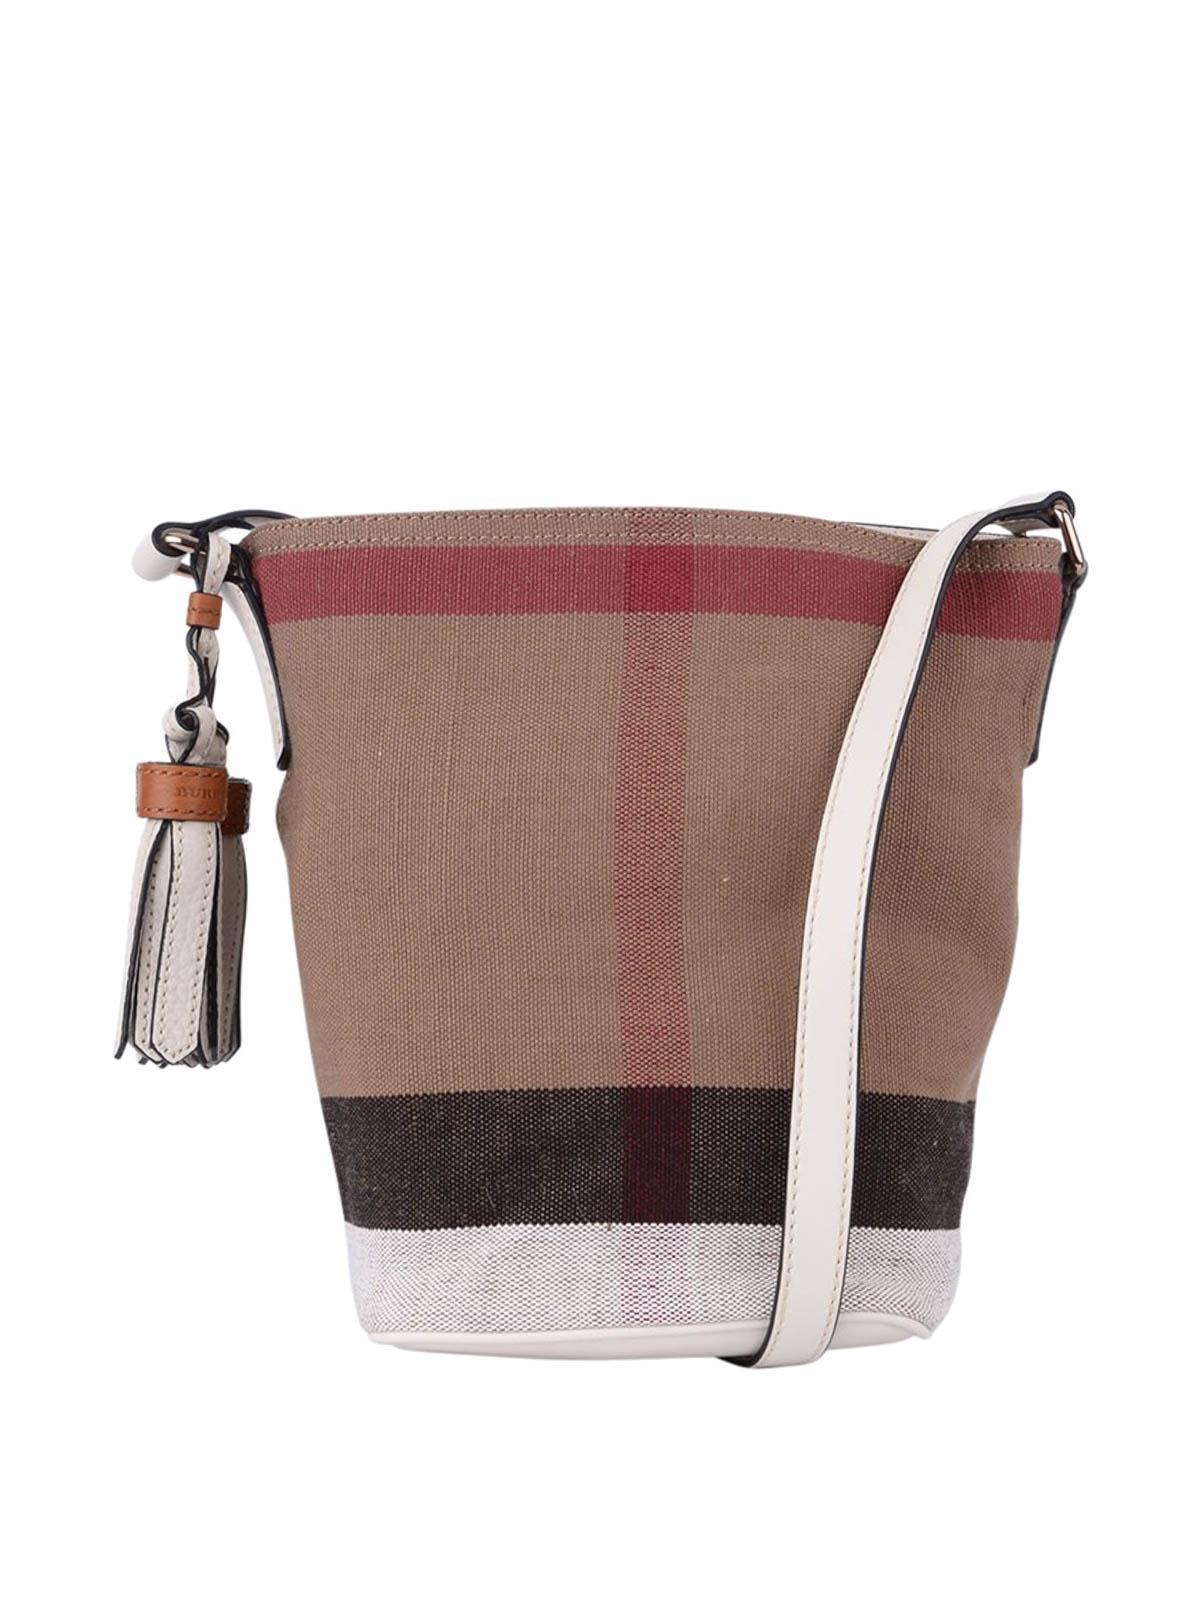 63b60d722342 Burberry Petite Ashby Canvas Bucket